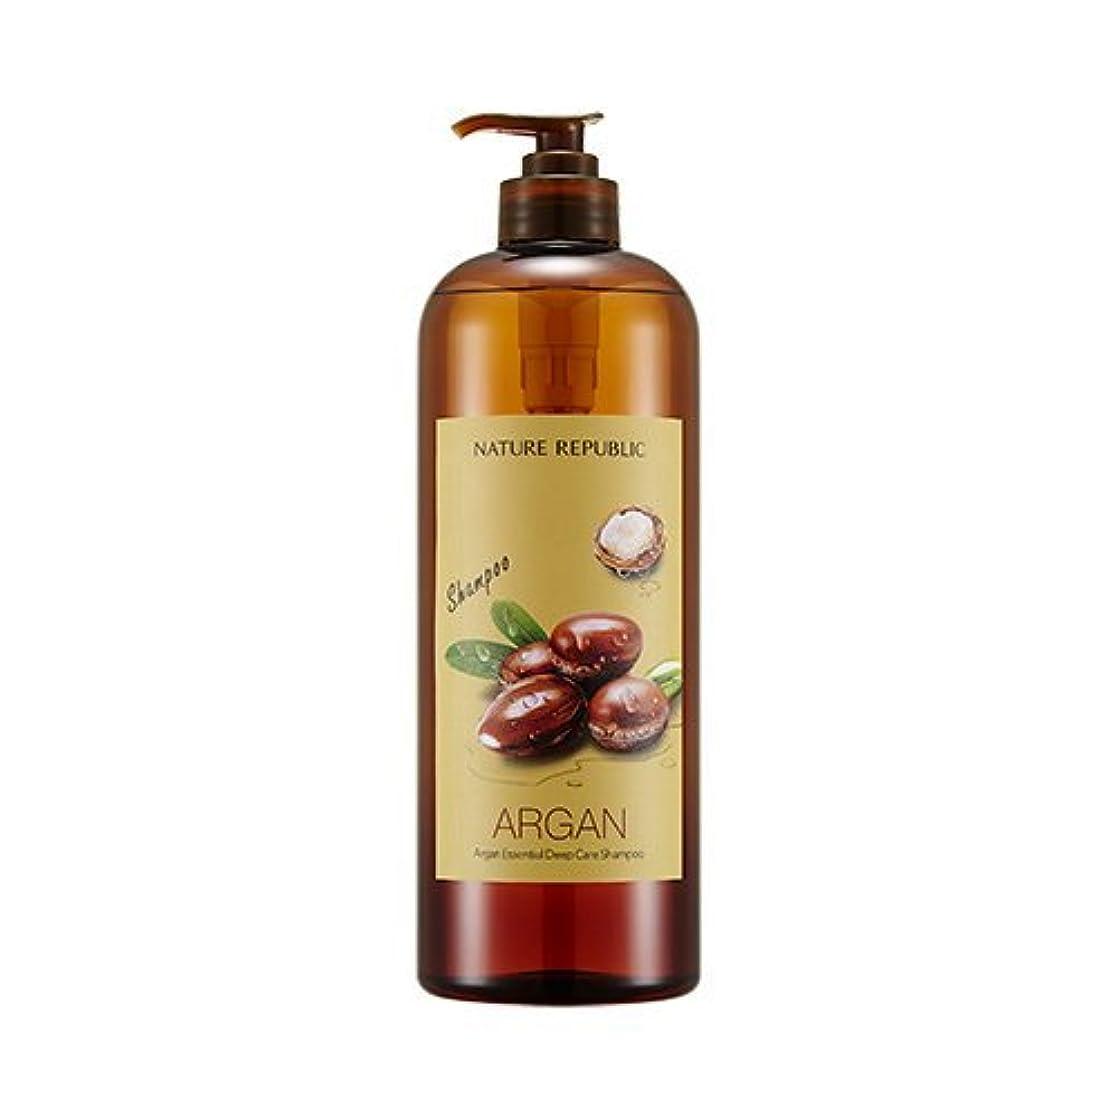 NATURE REPUBLIC Argan Essential Deep Care Shampoo 1000? ネイチャーリパブリック アルガンエッセンシャルディープケアシャンプー(大容量) [並行輸入品]